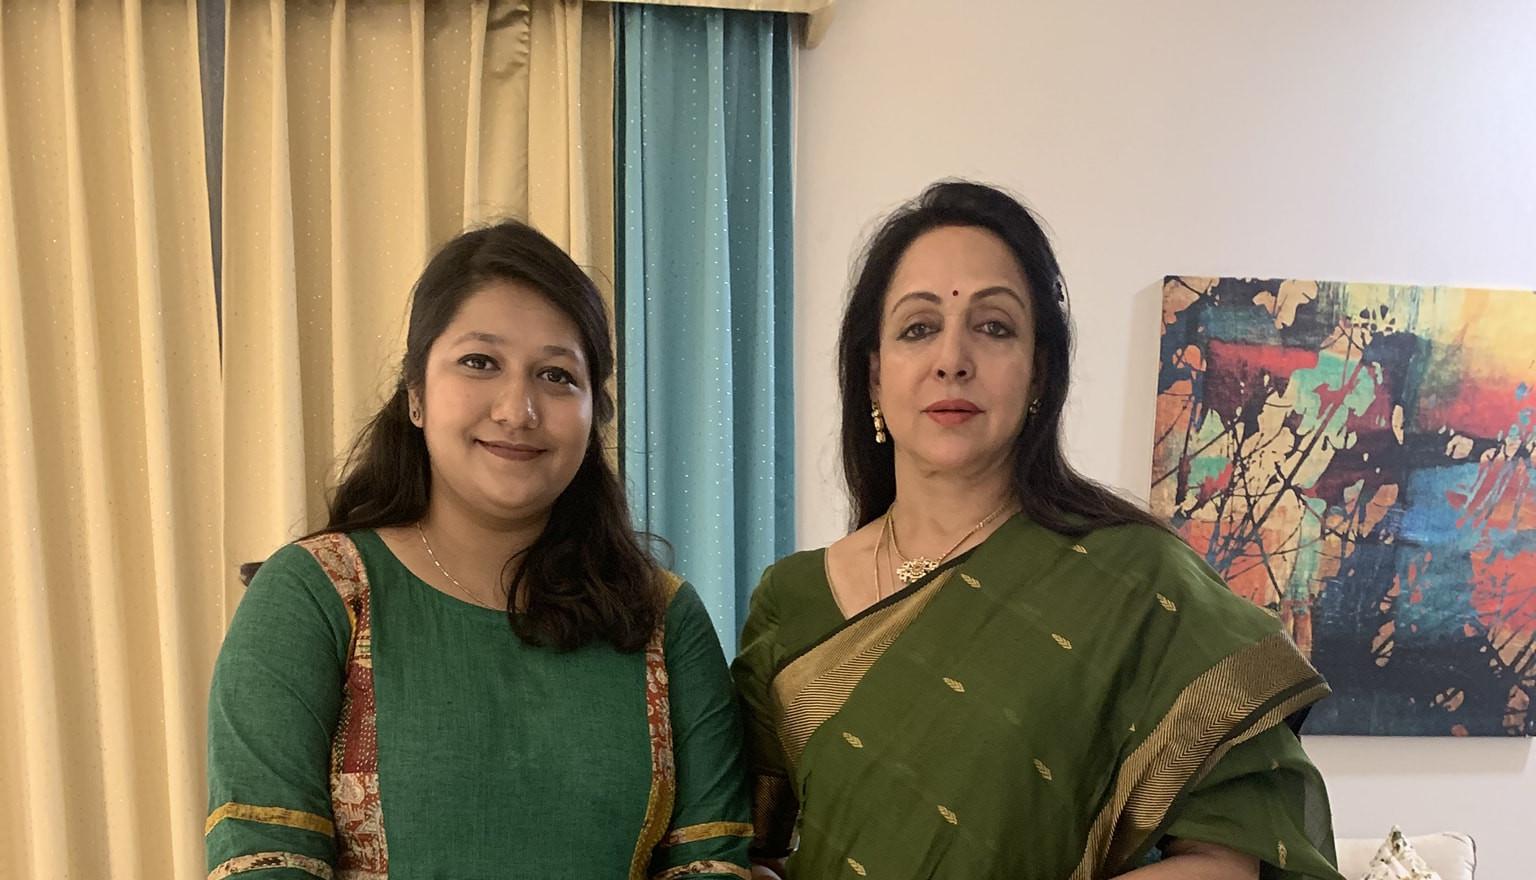 Meeting with Hema Malini Ji at her residence